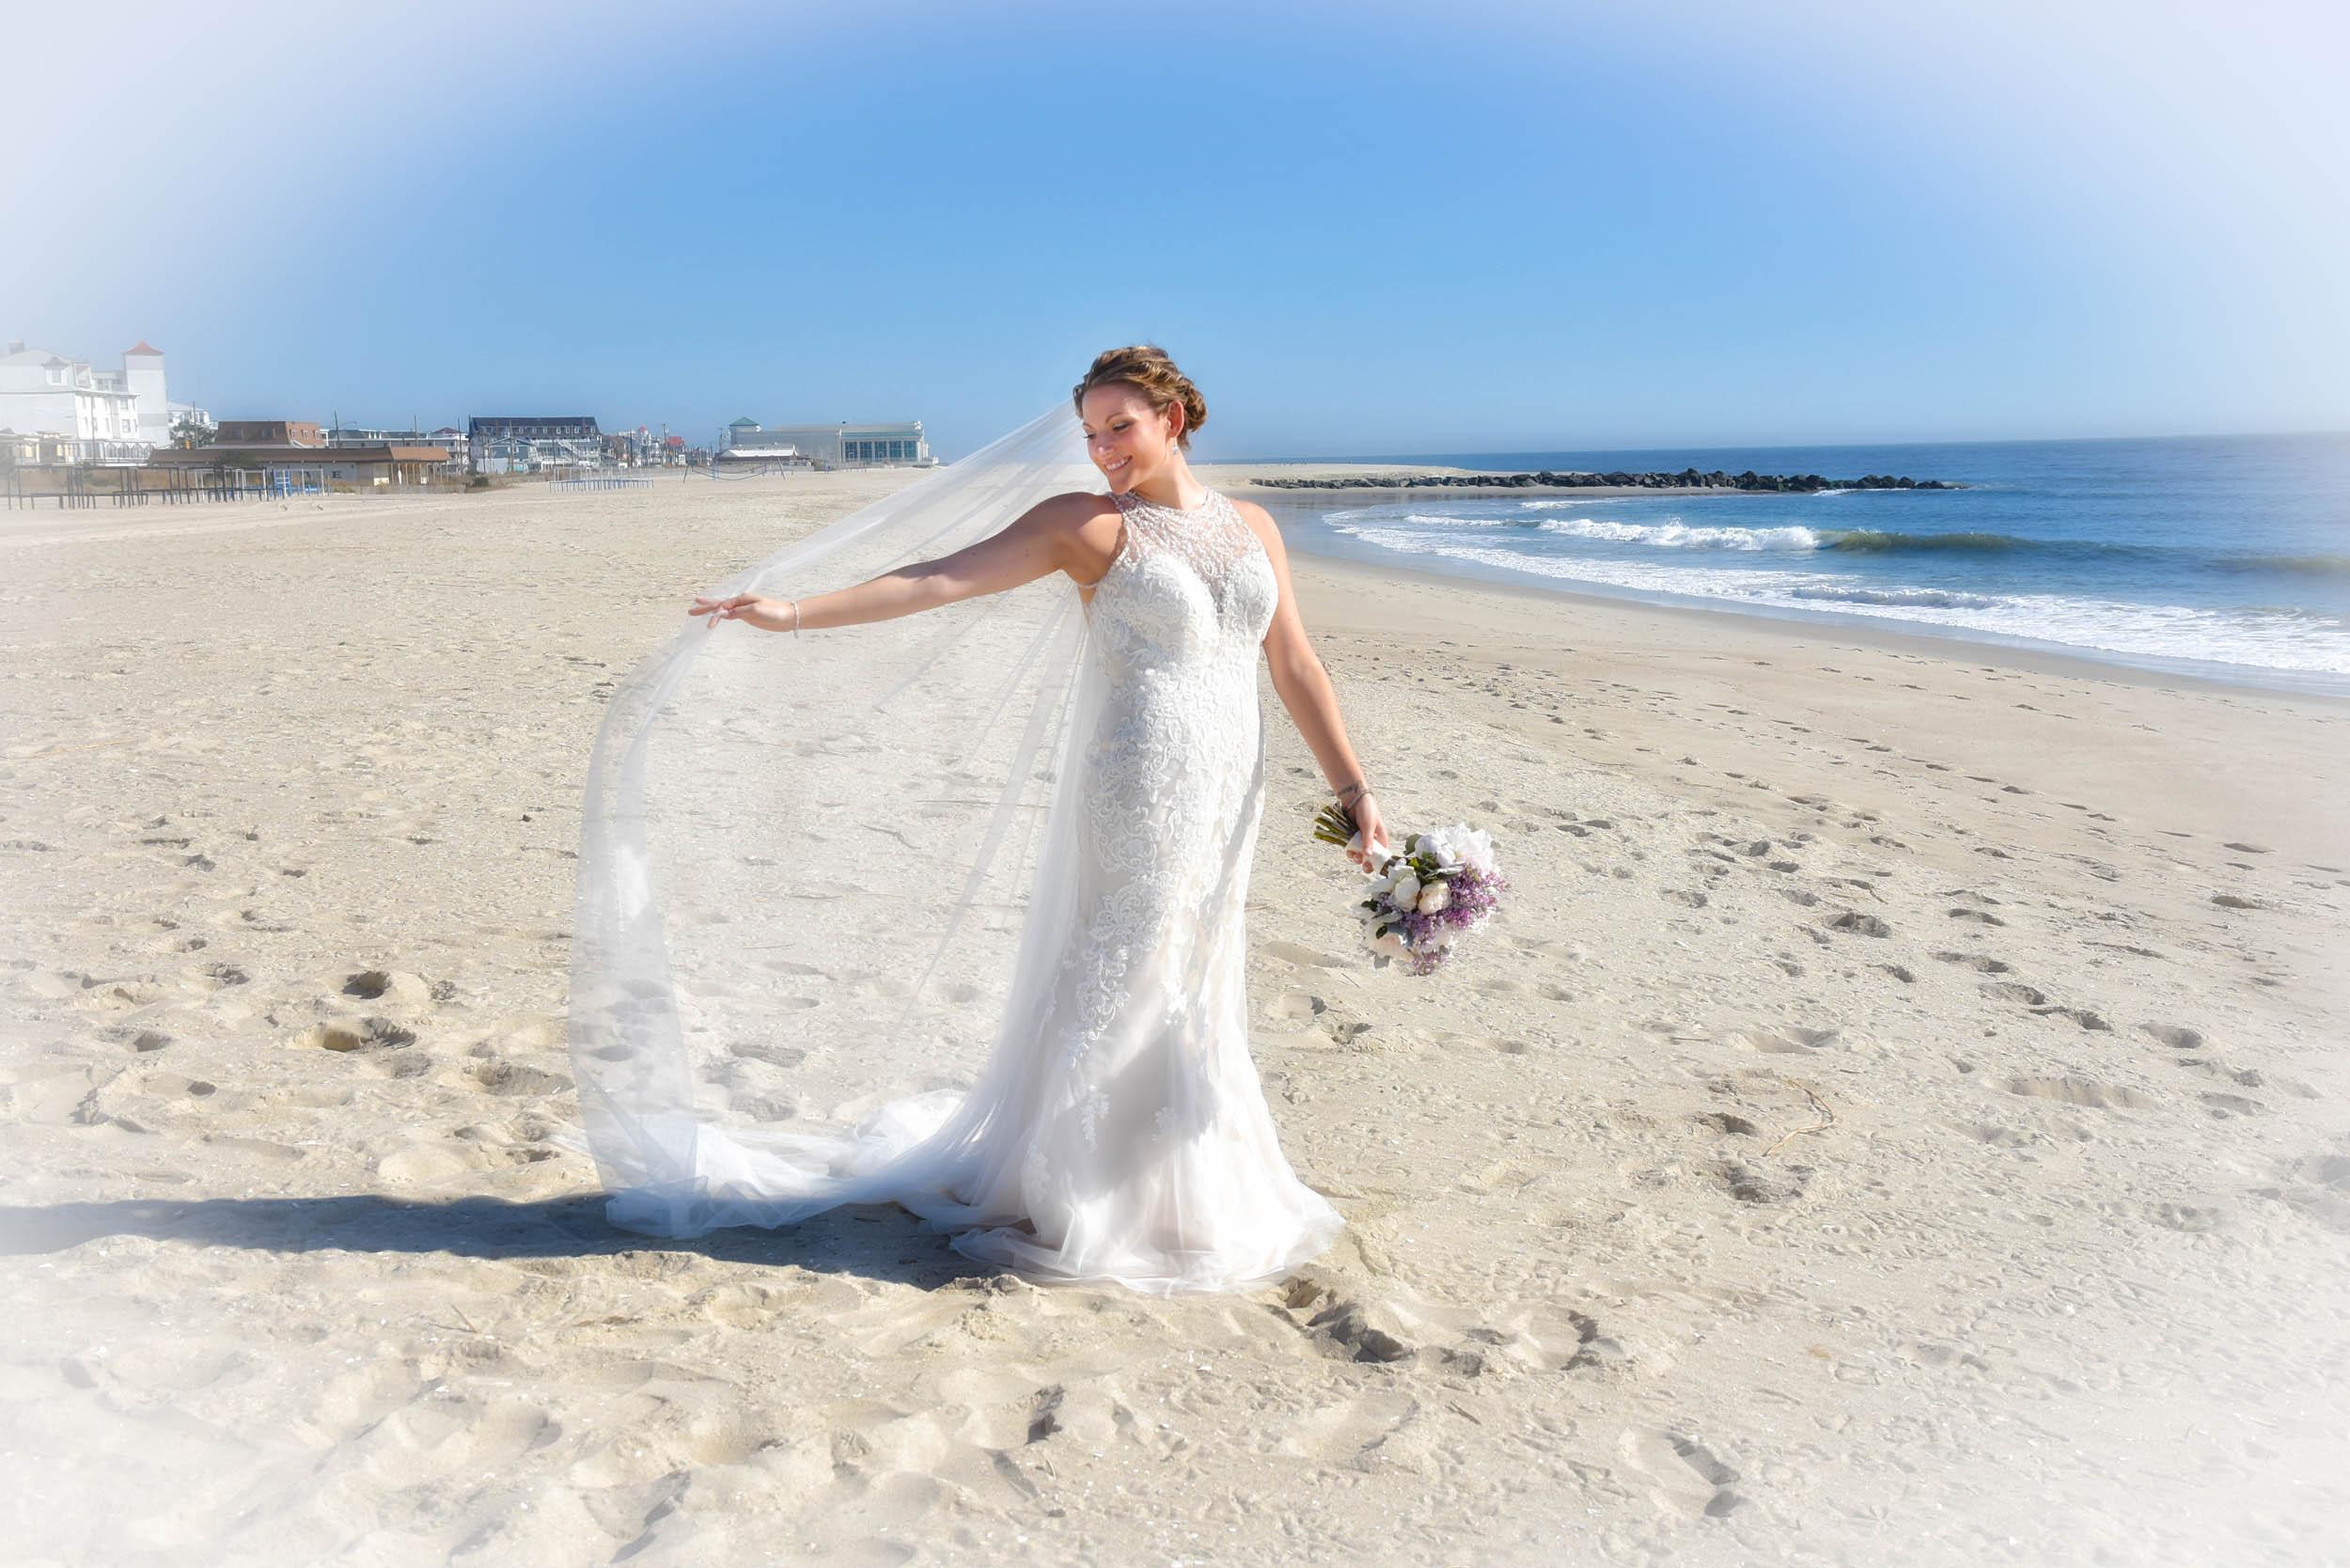 Cape May beach bride